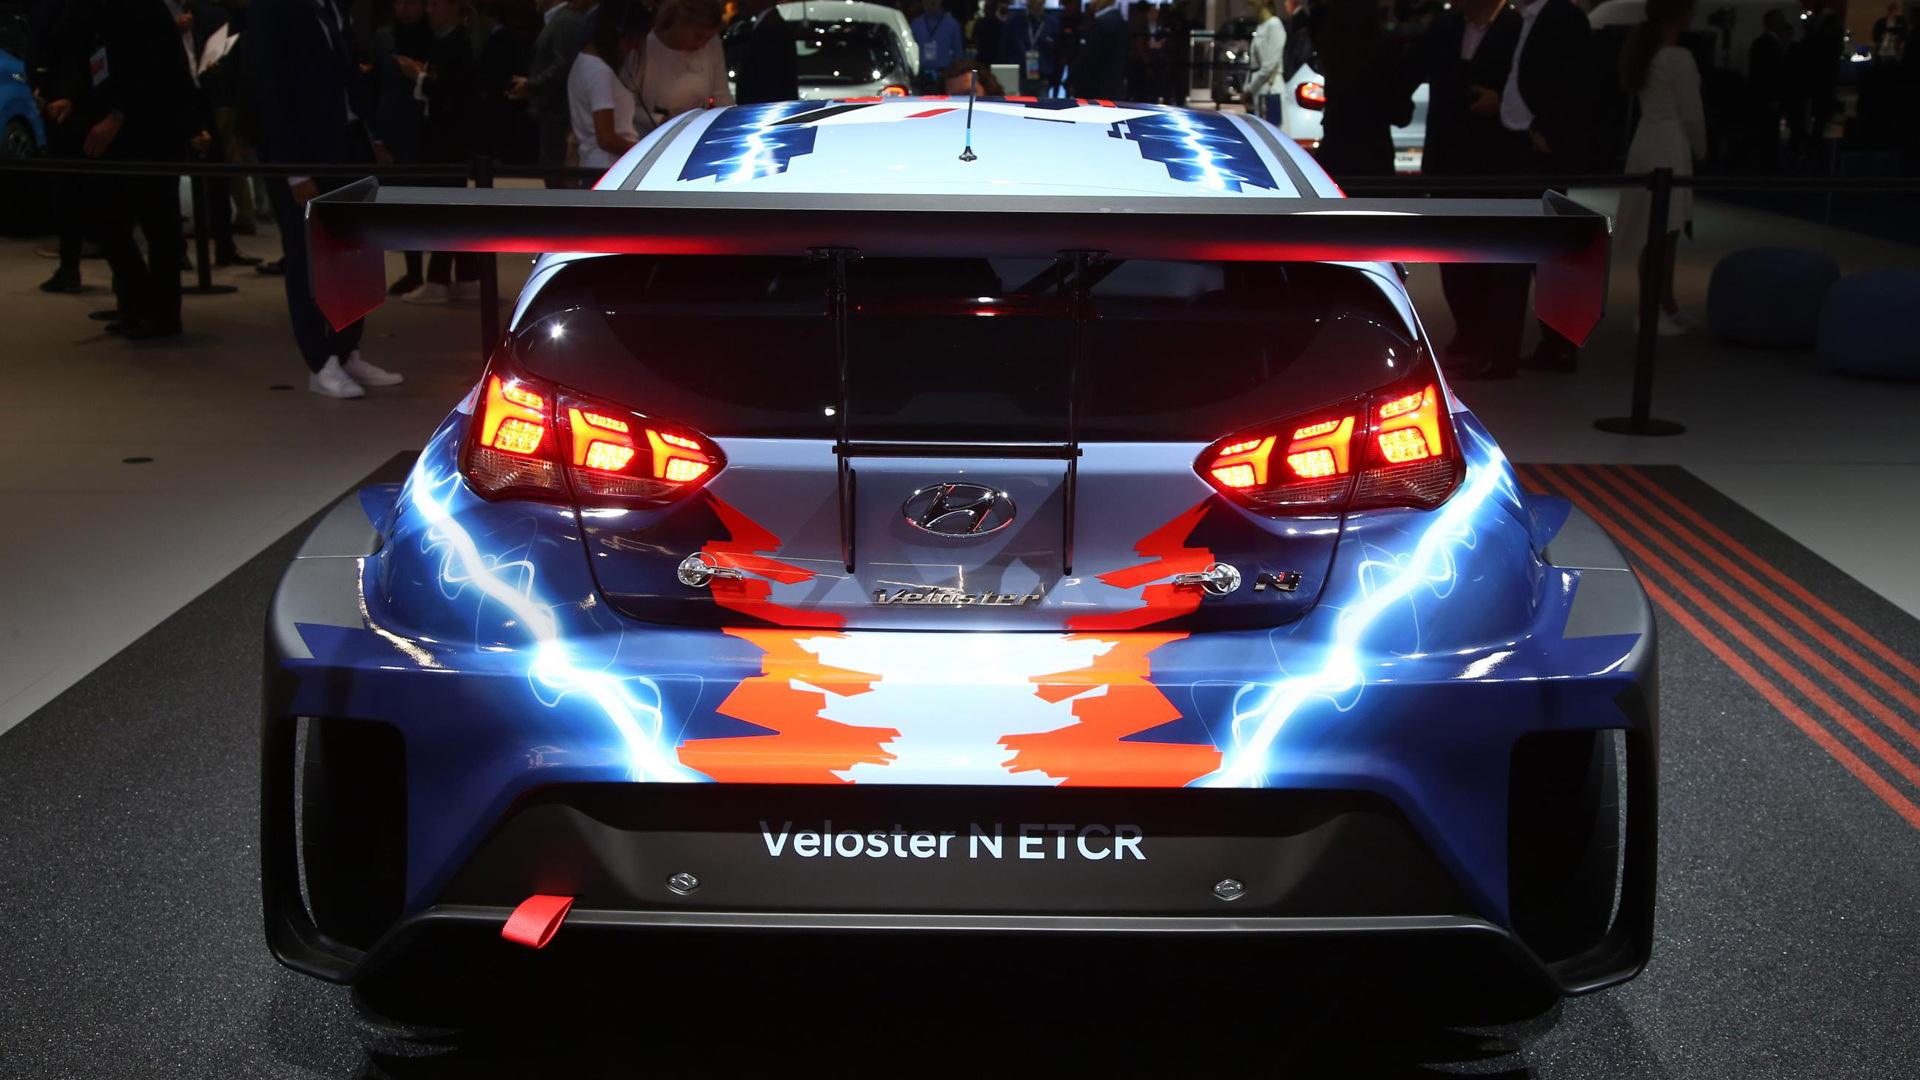 2020 Hyundai Veloster N ETCR race car